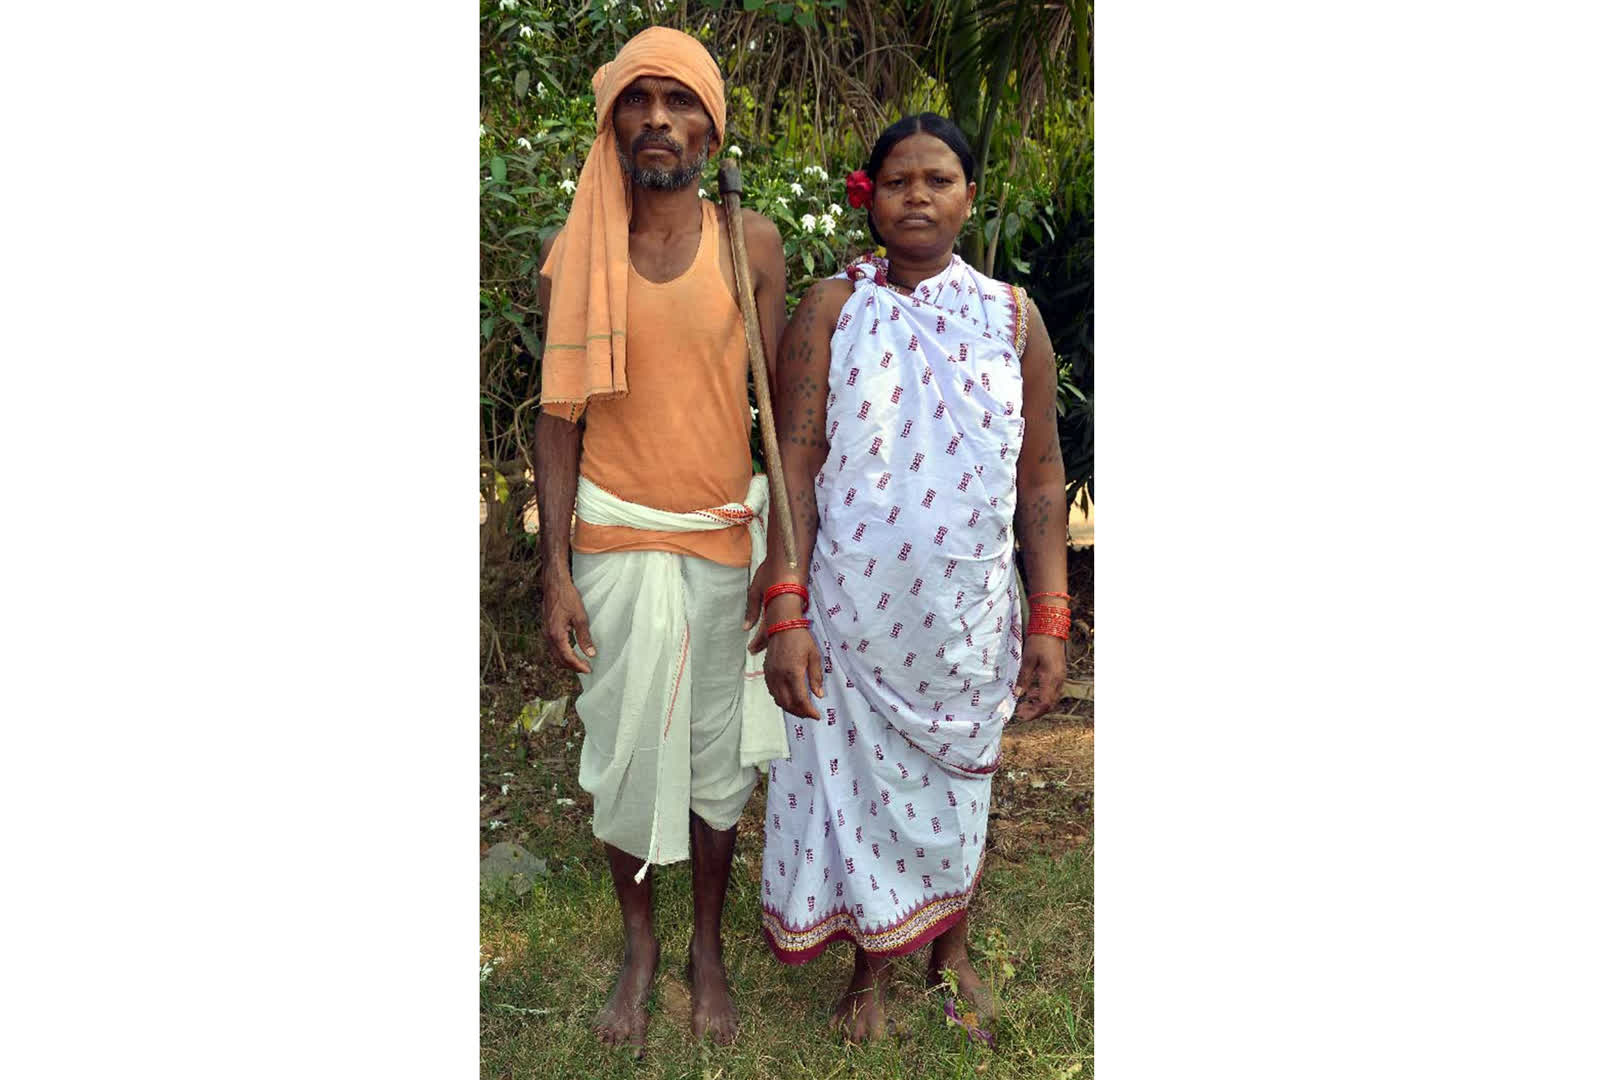 Members of the Bhottada tribe dressed in Kotpad